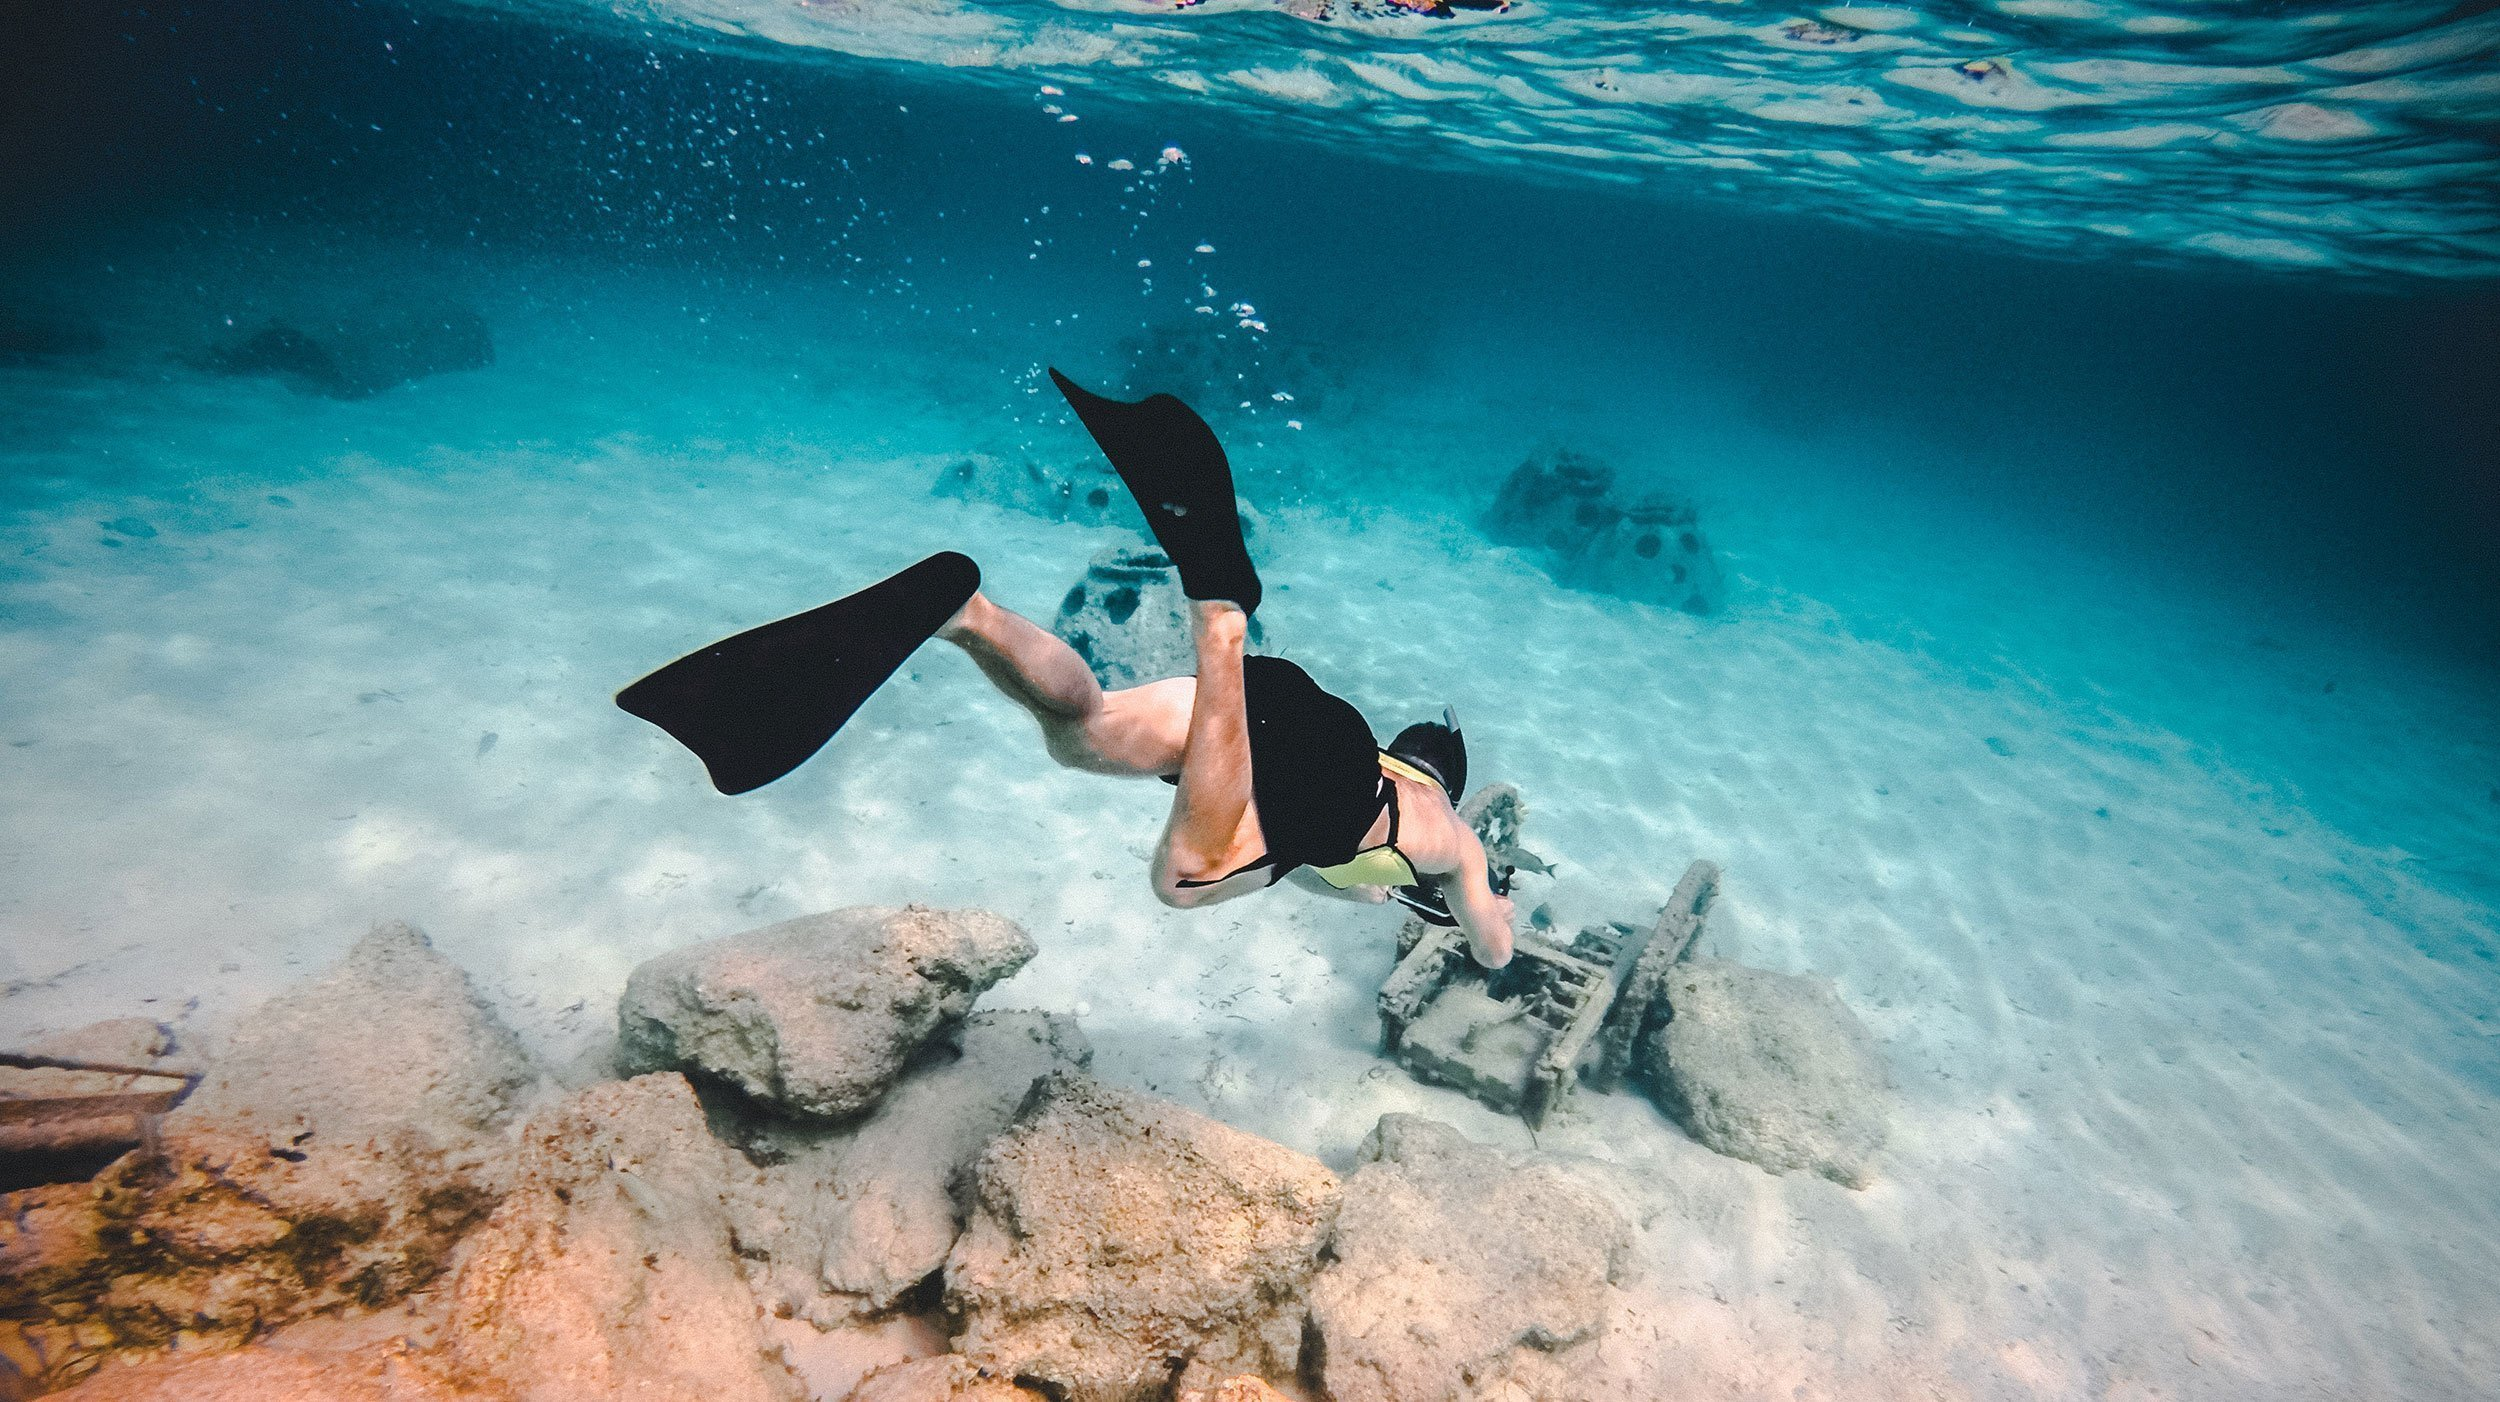 man snorkeling underwater in Mediterranean